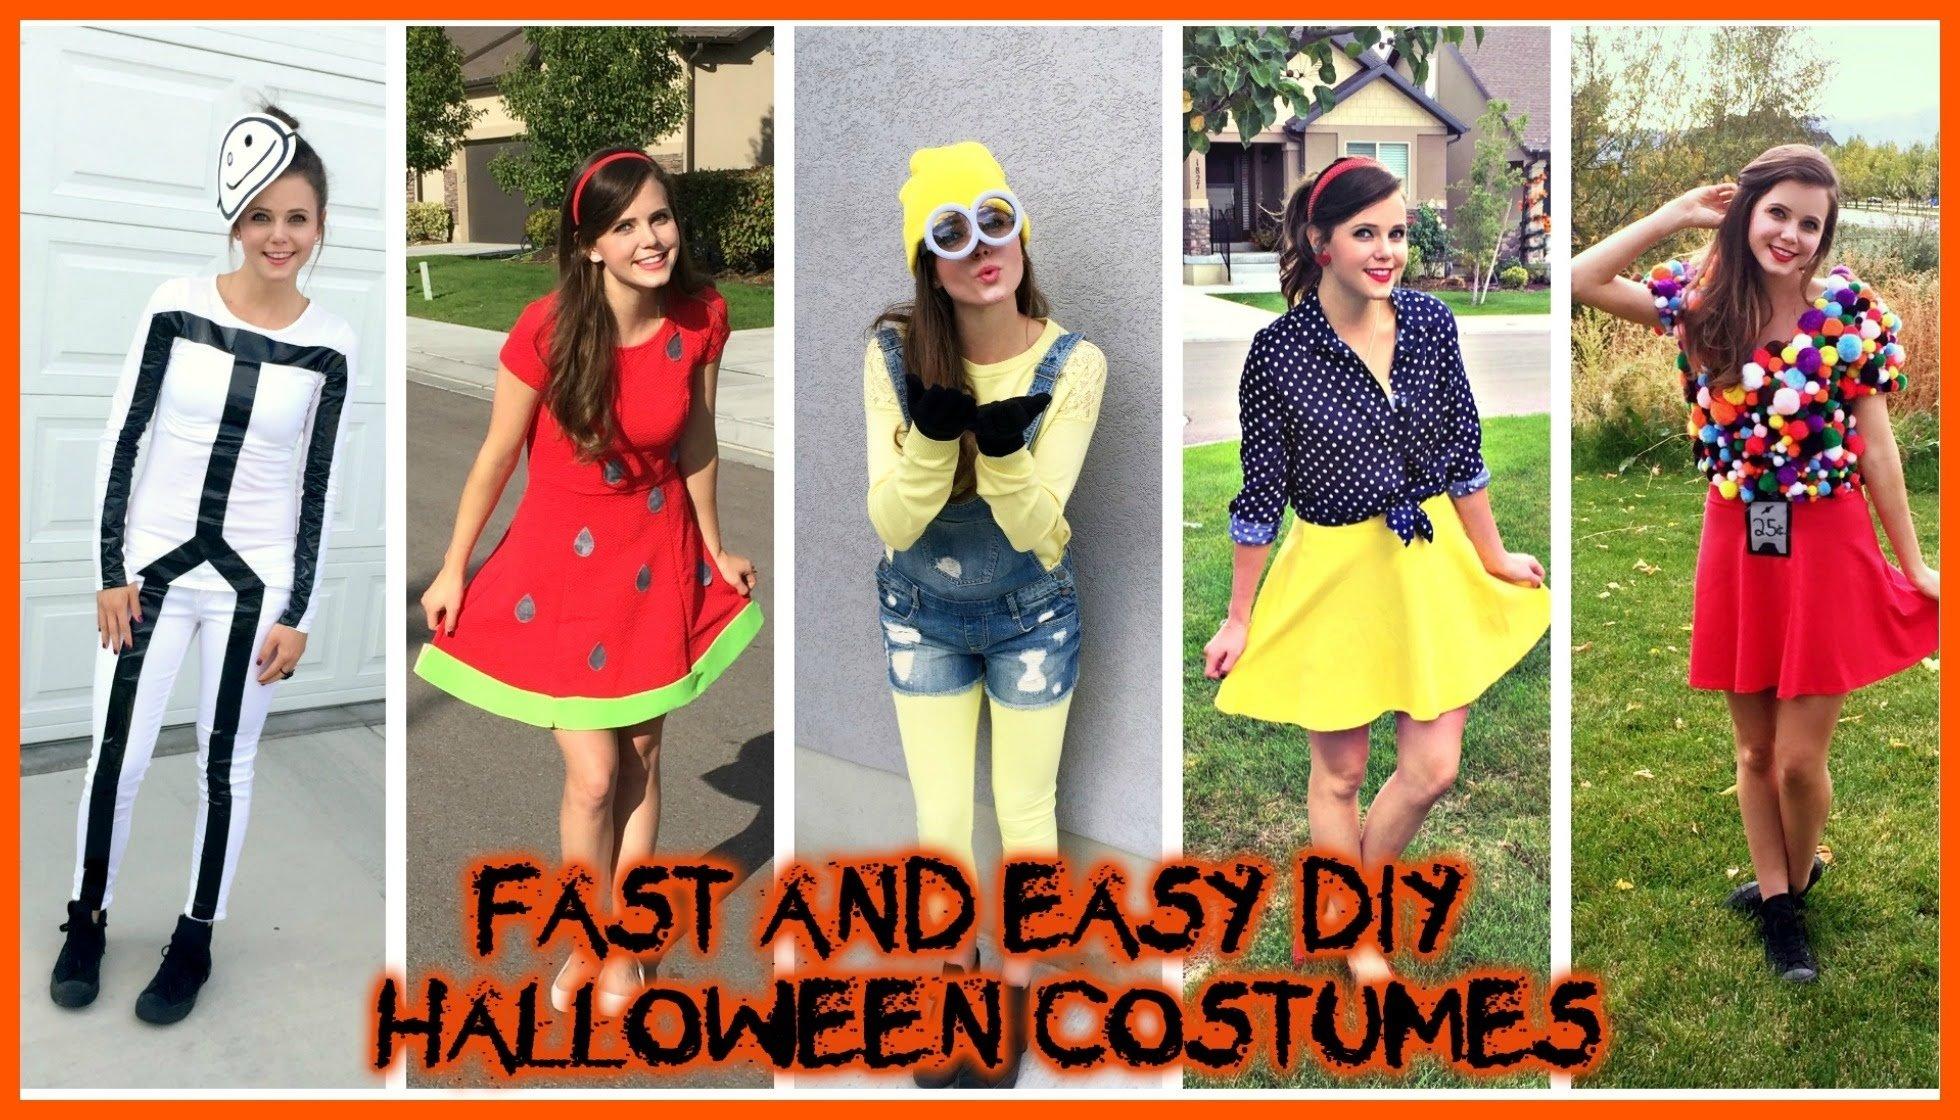 10 Best Easy Last Minute Costume Ideas diy halloween costumes super easy cheap last minute ideas tiffany 20 2020